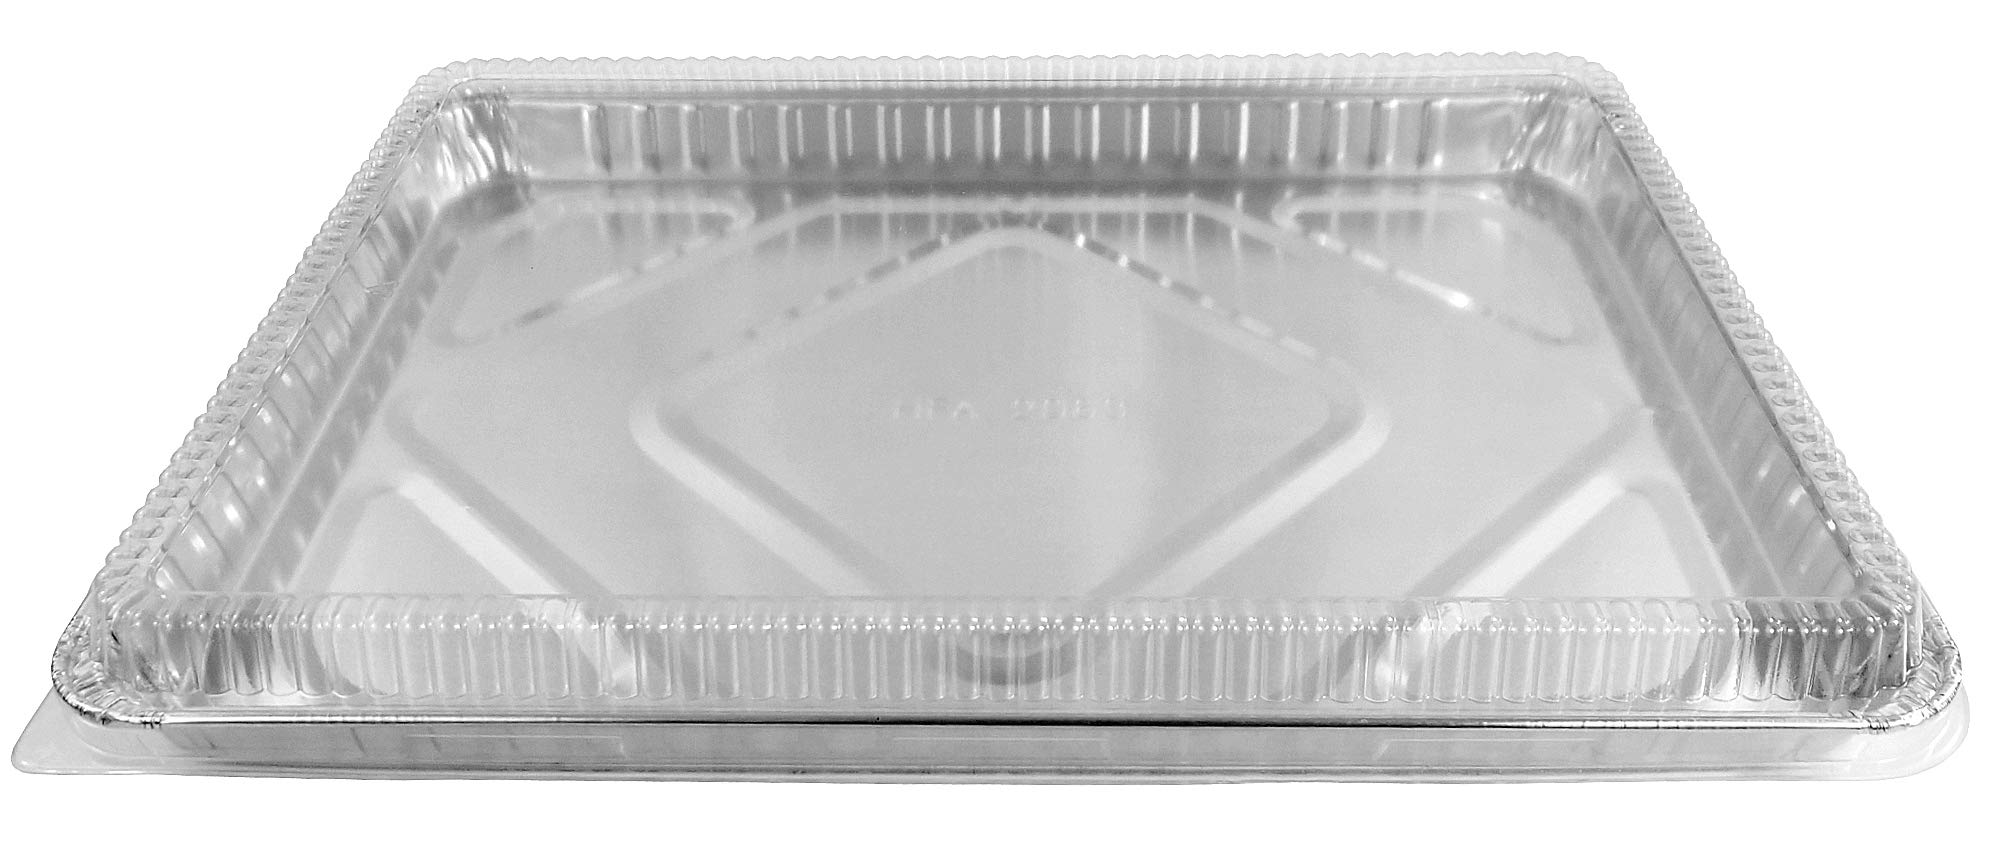 Handi Foil Half 1 2 Size Sheet Cake Aluminum Foil Pan W